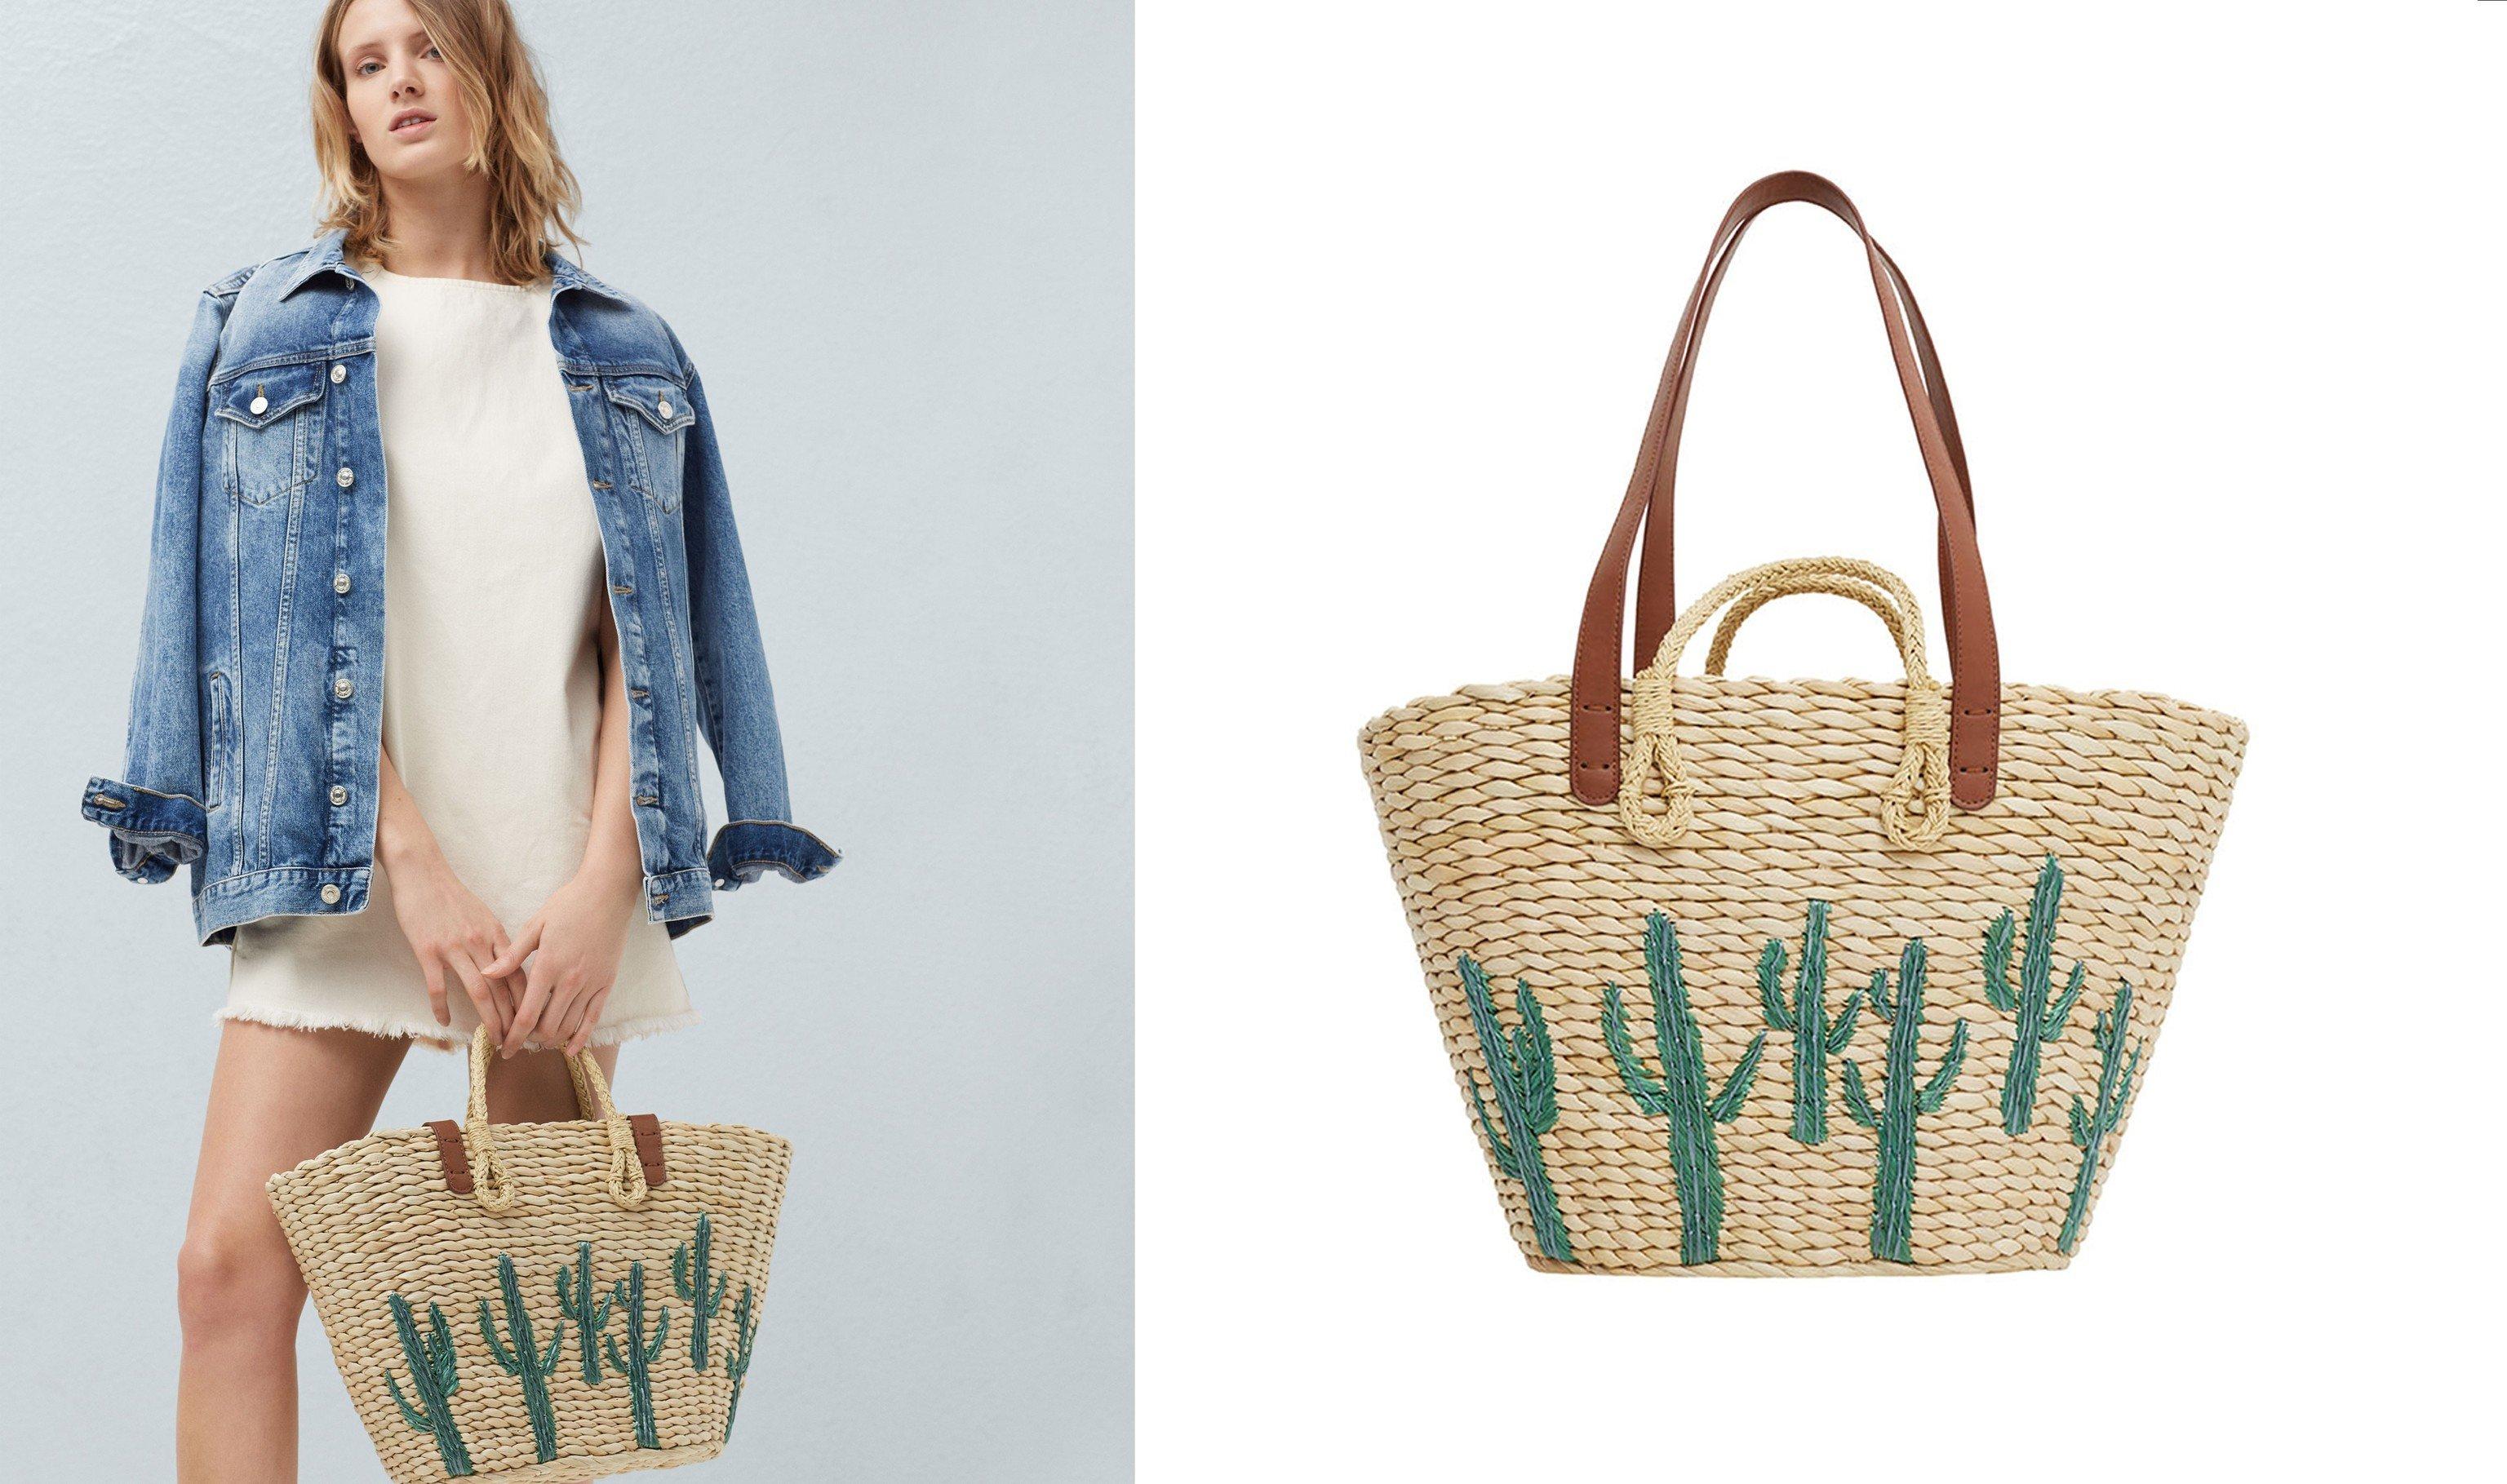 Style + Design handbag bag tote bag fashion accessory pattern